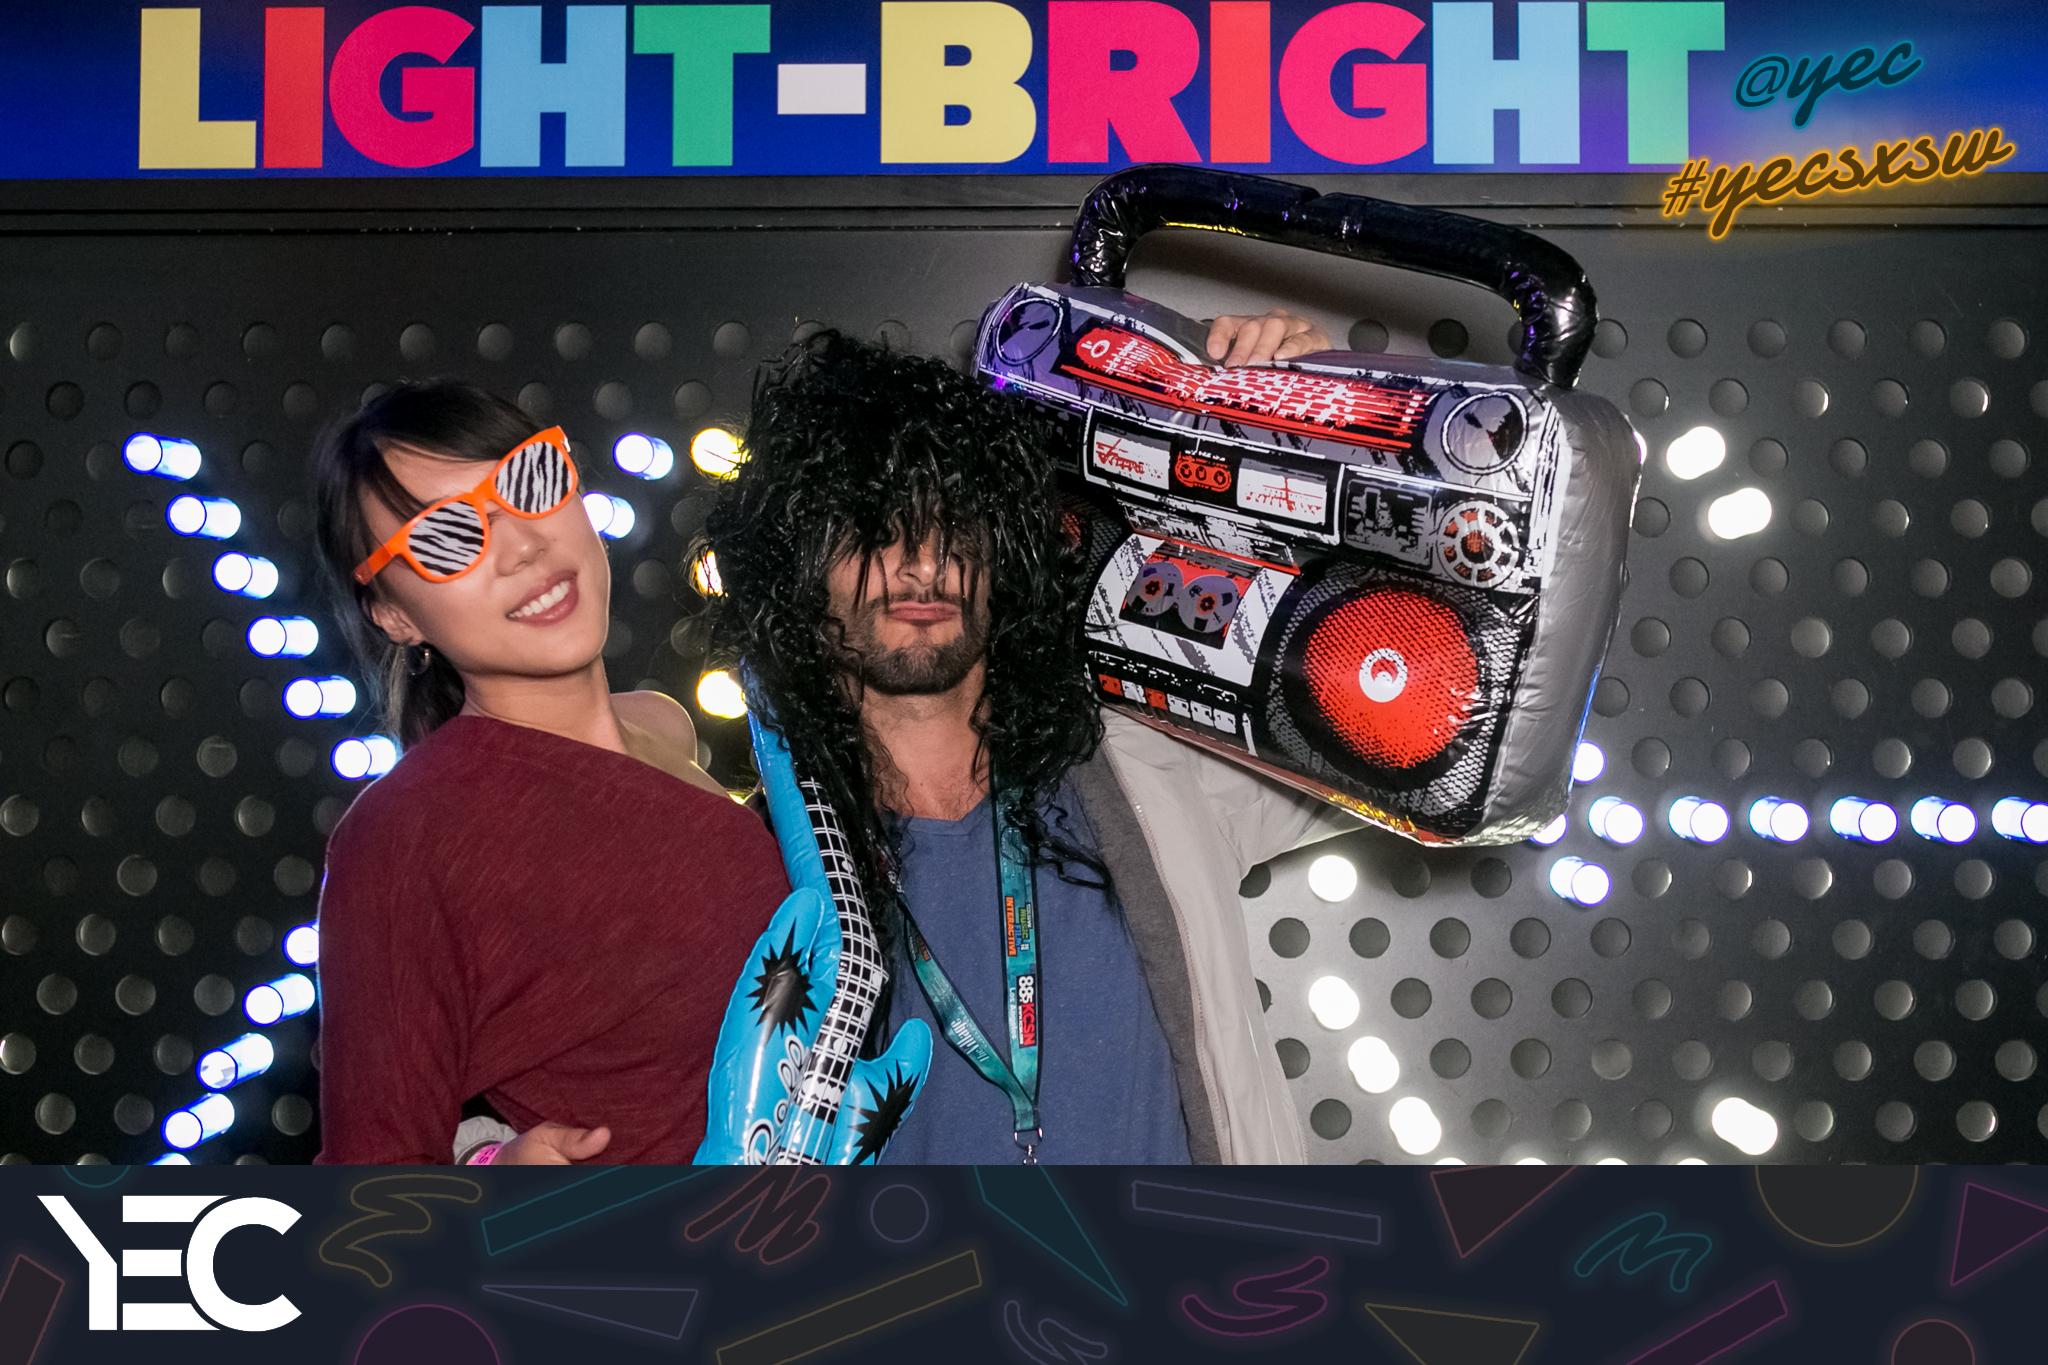 YEC Light Bright